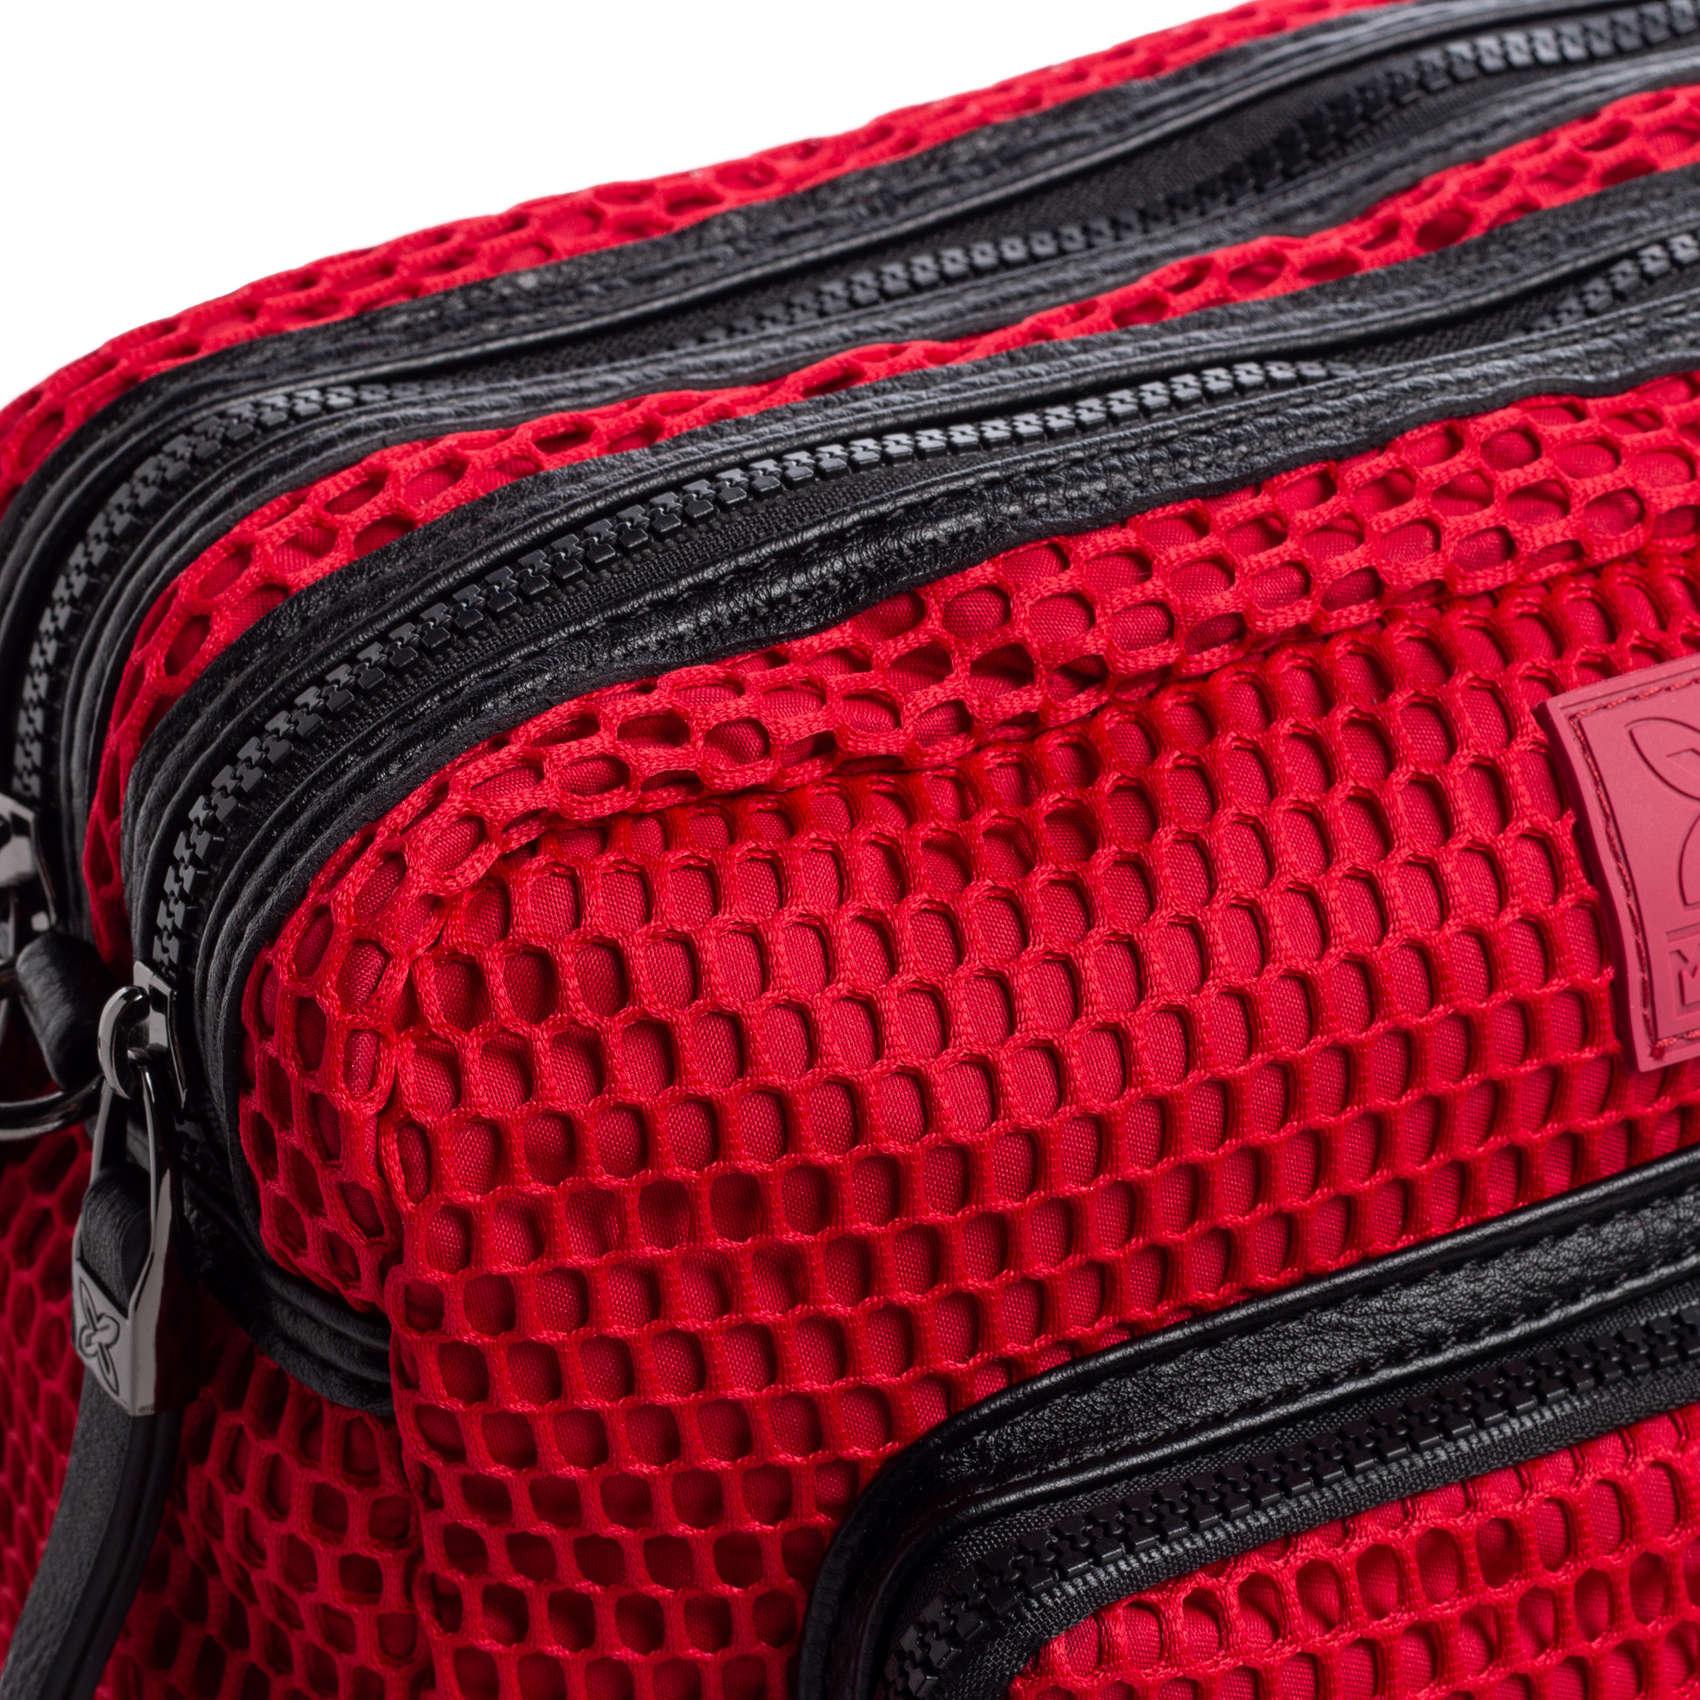 NET BANDOLERA RED